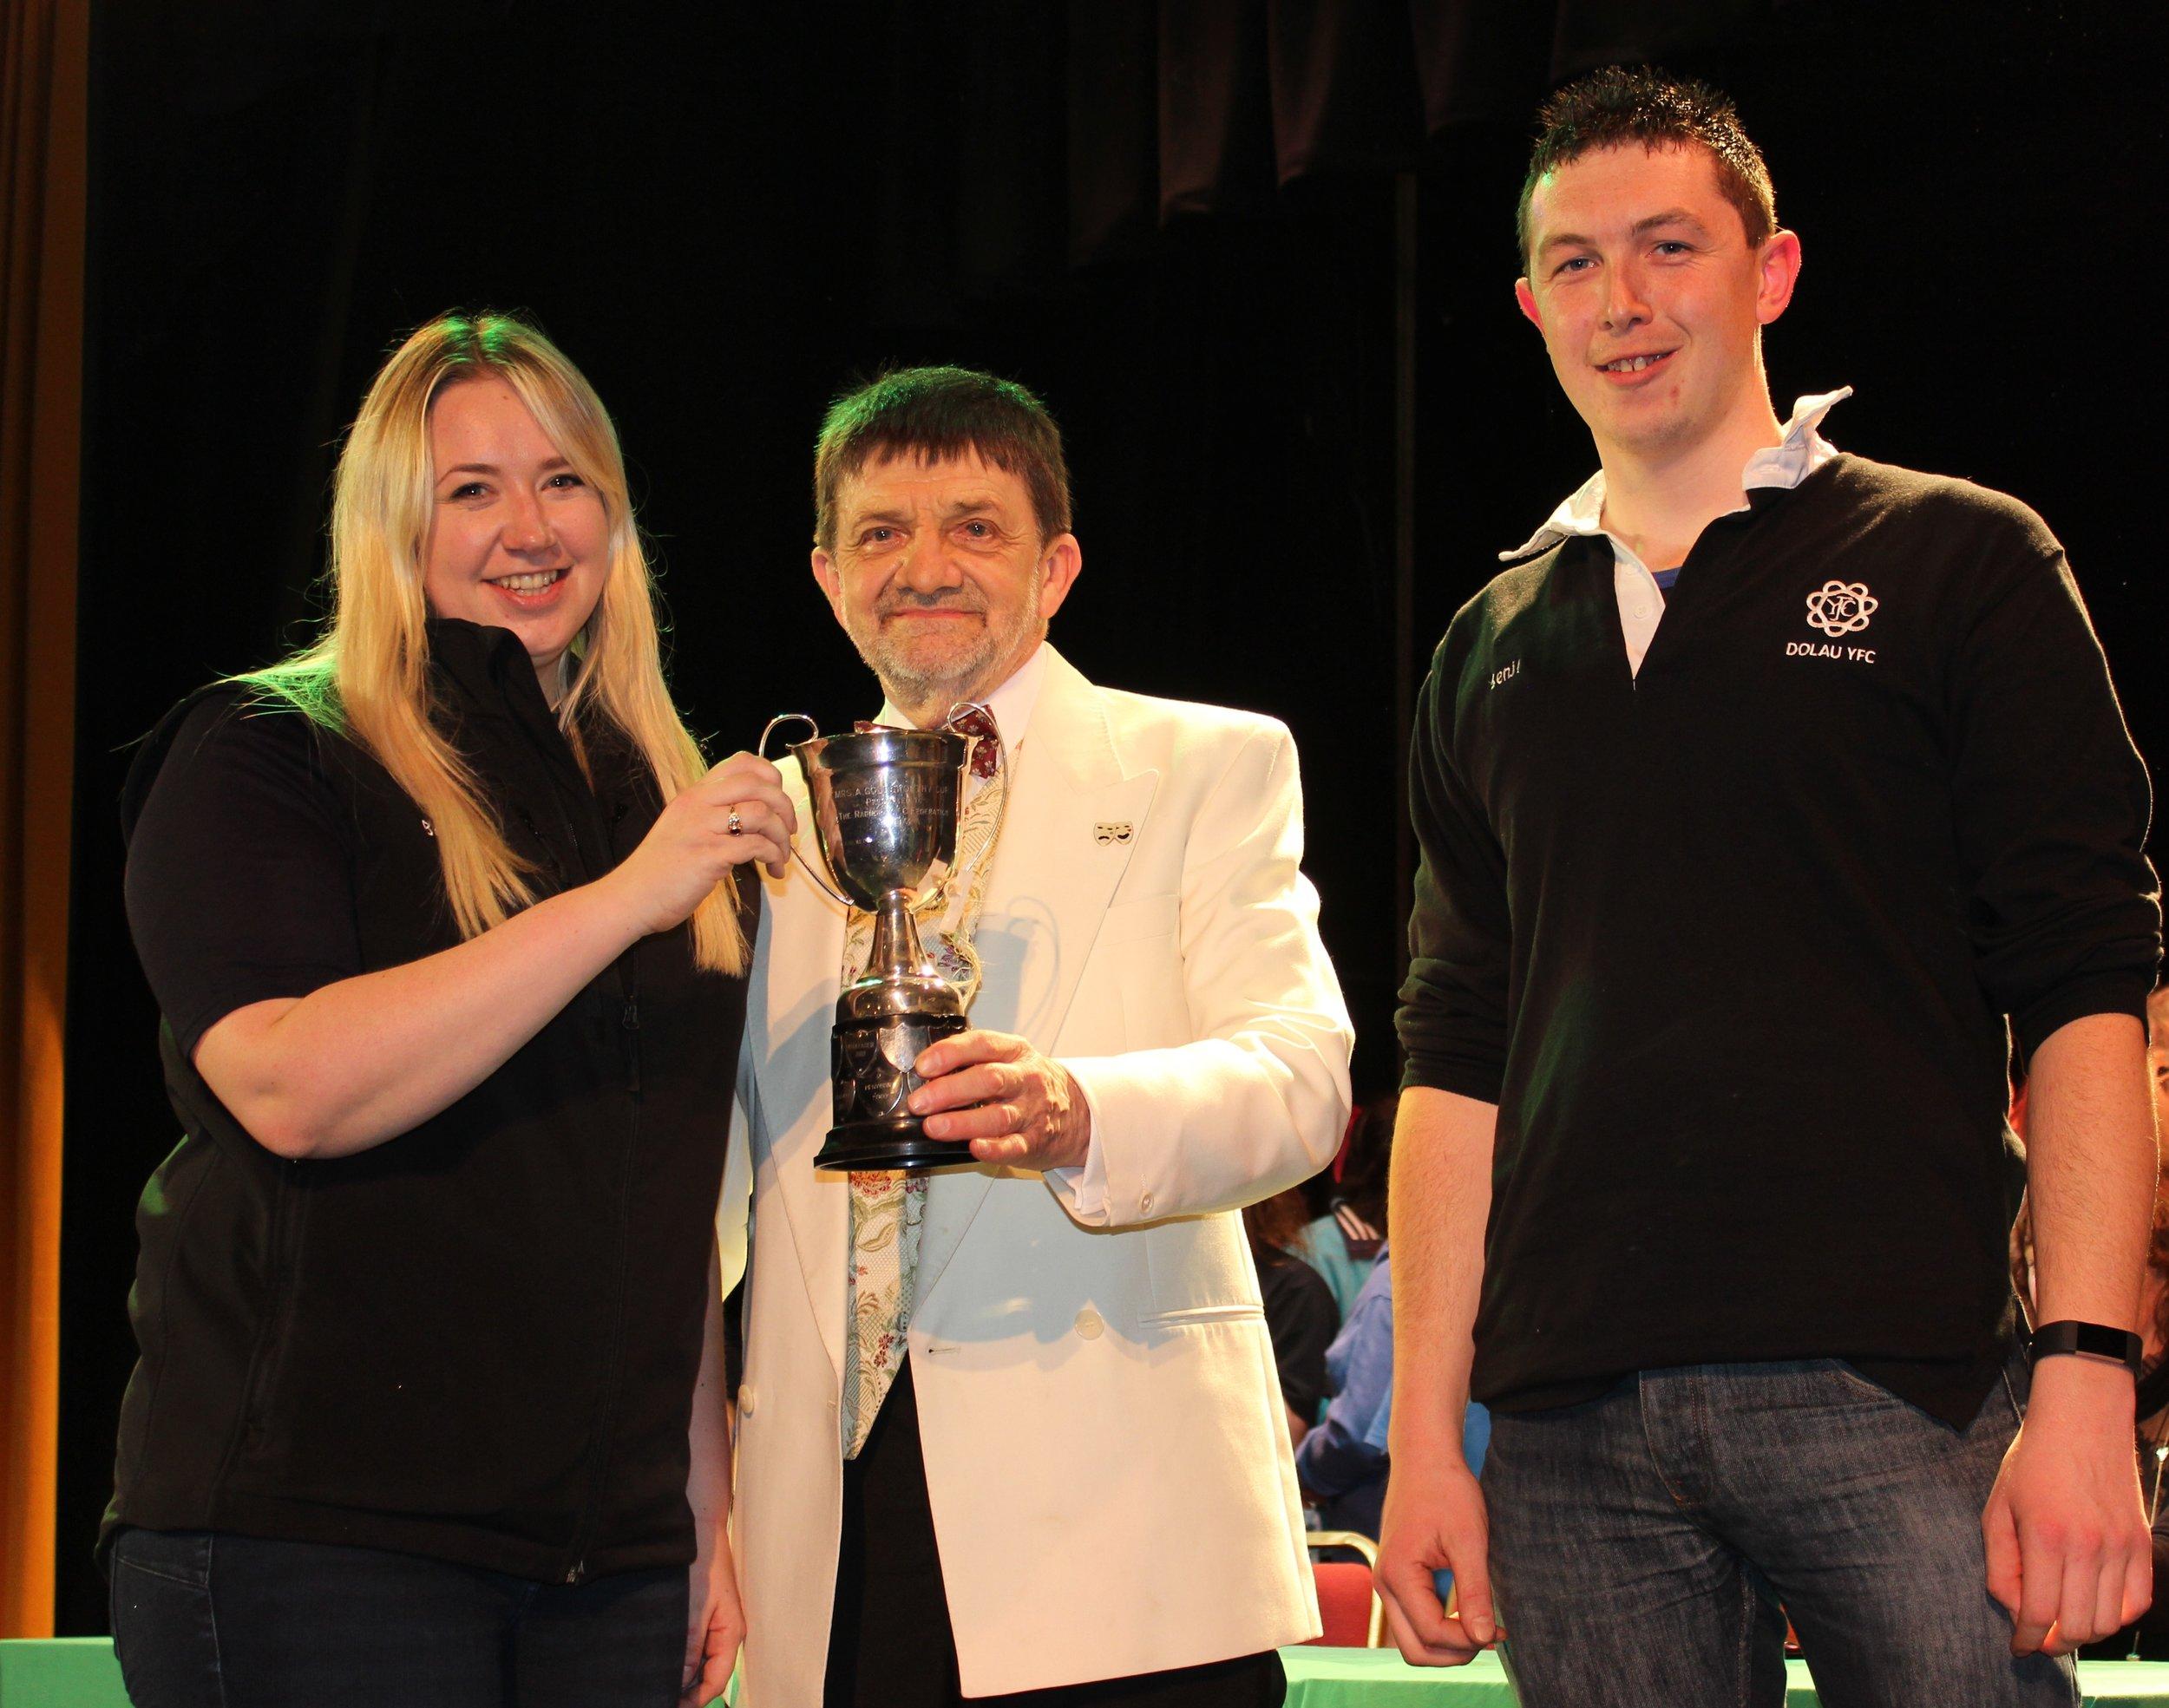 Gemma Bufton & Ben Hardwick, Dolau YFC with Entertainment Adjudicator Mr Ian Sarginson - Anna Goldsworthy Cup for 2nd Place.